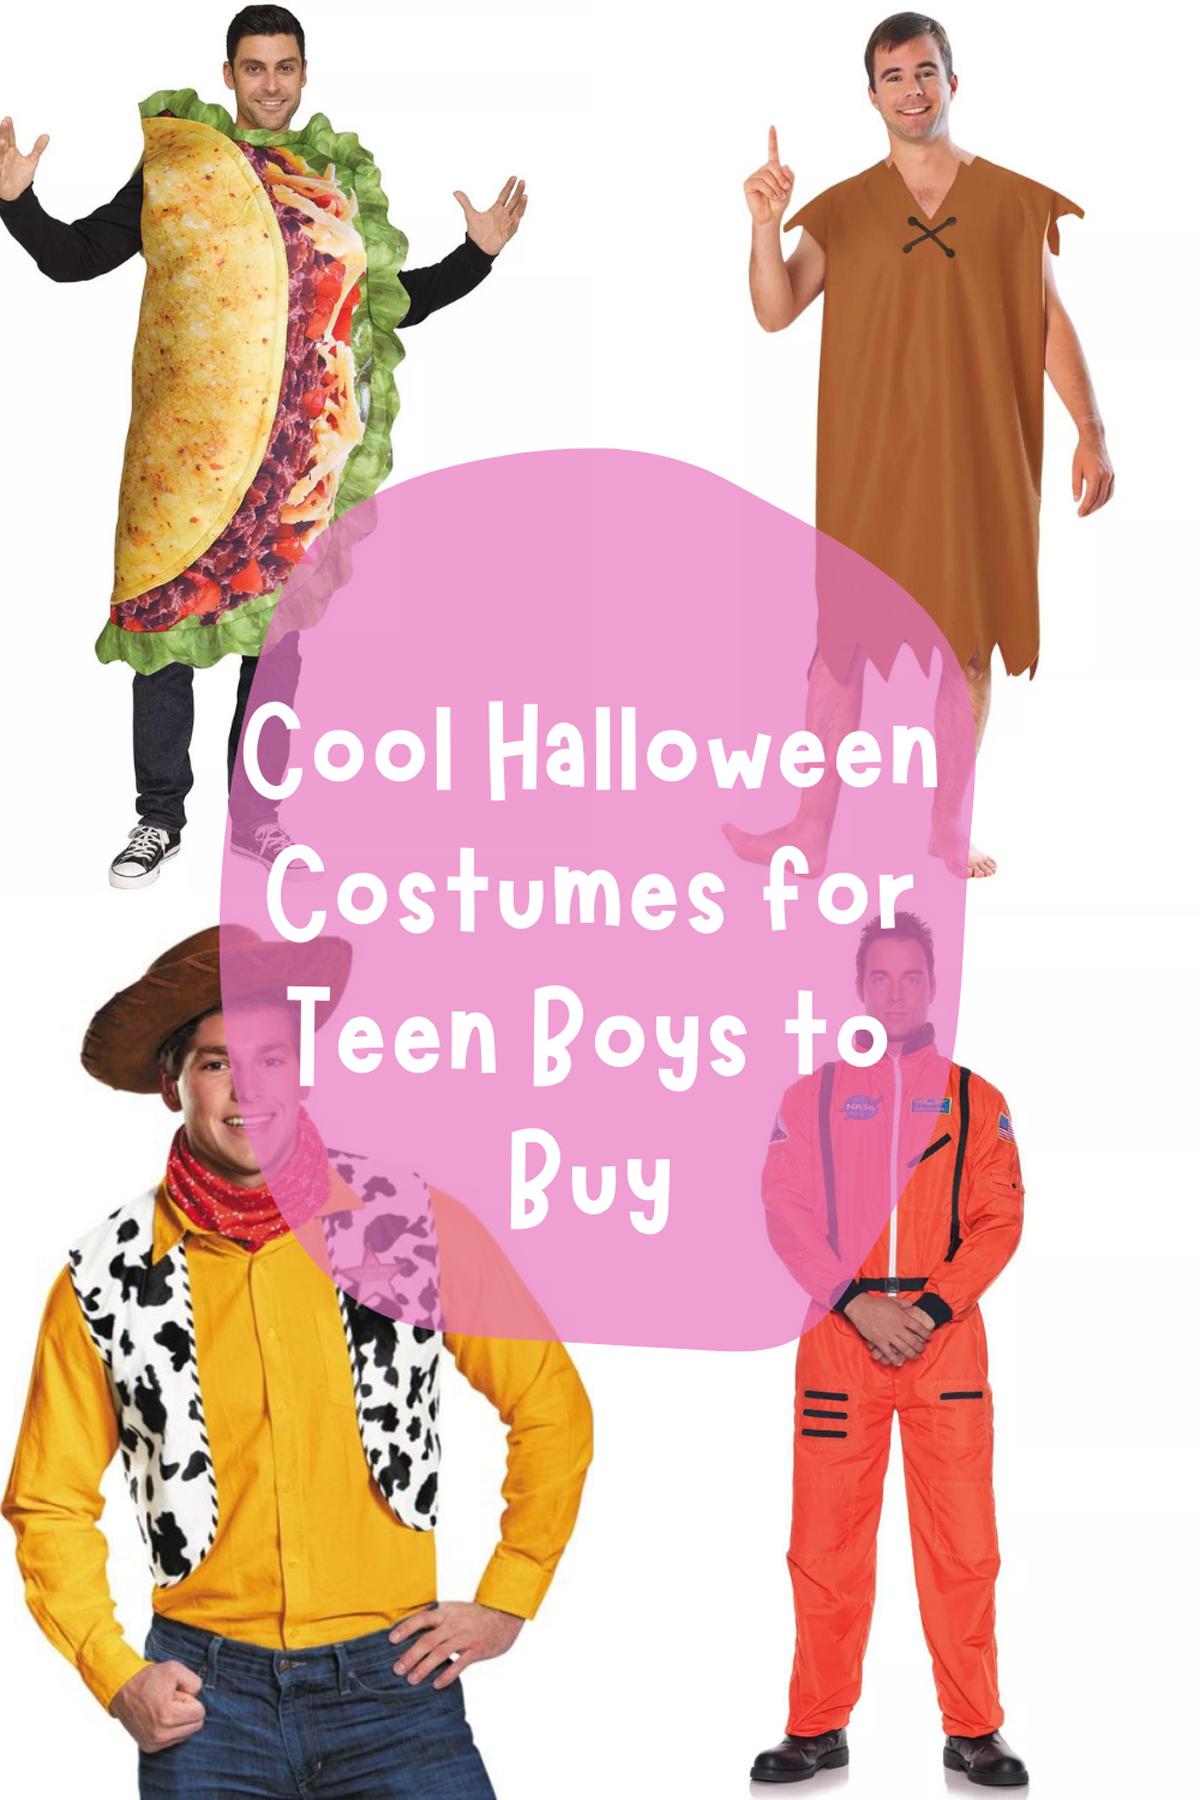 Costumes To Buy Teens